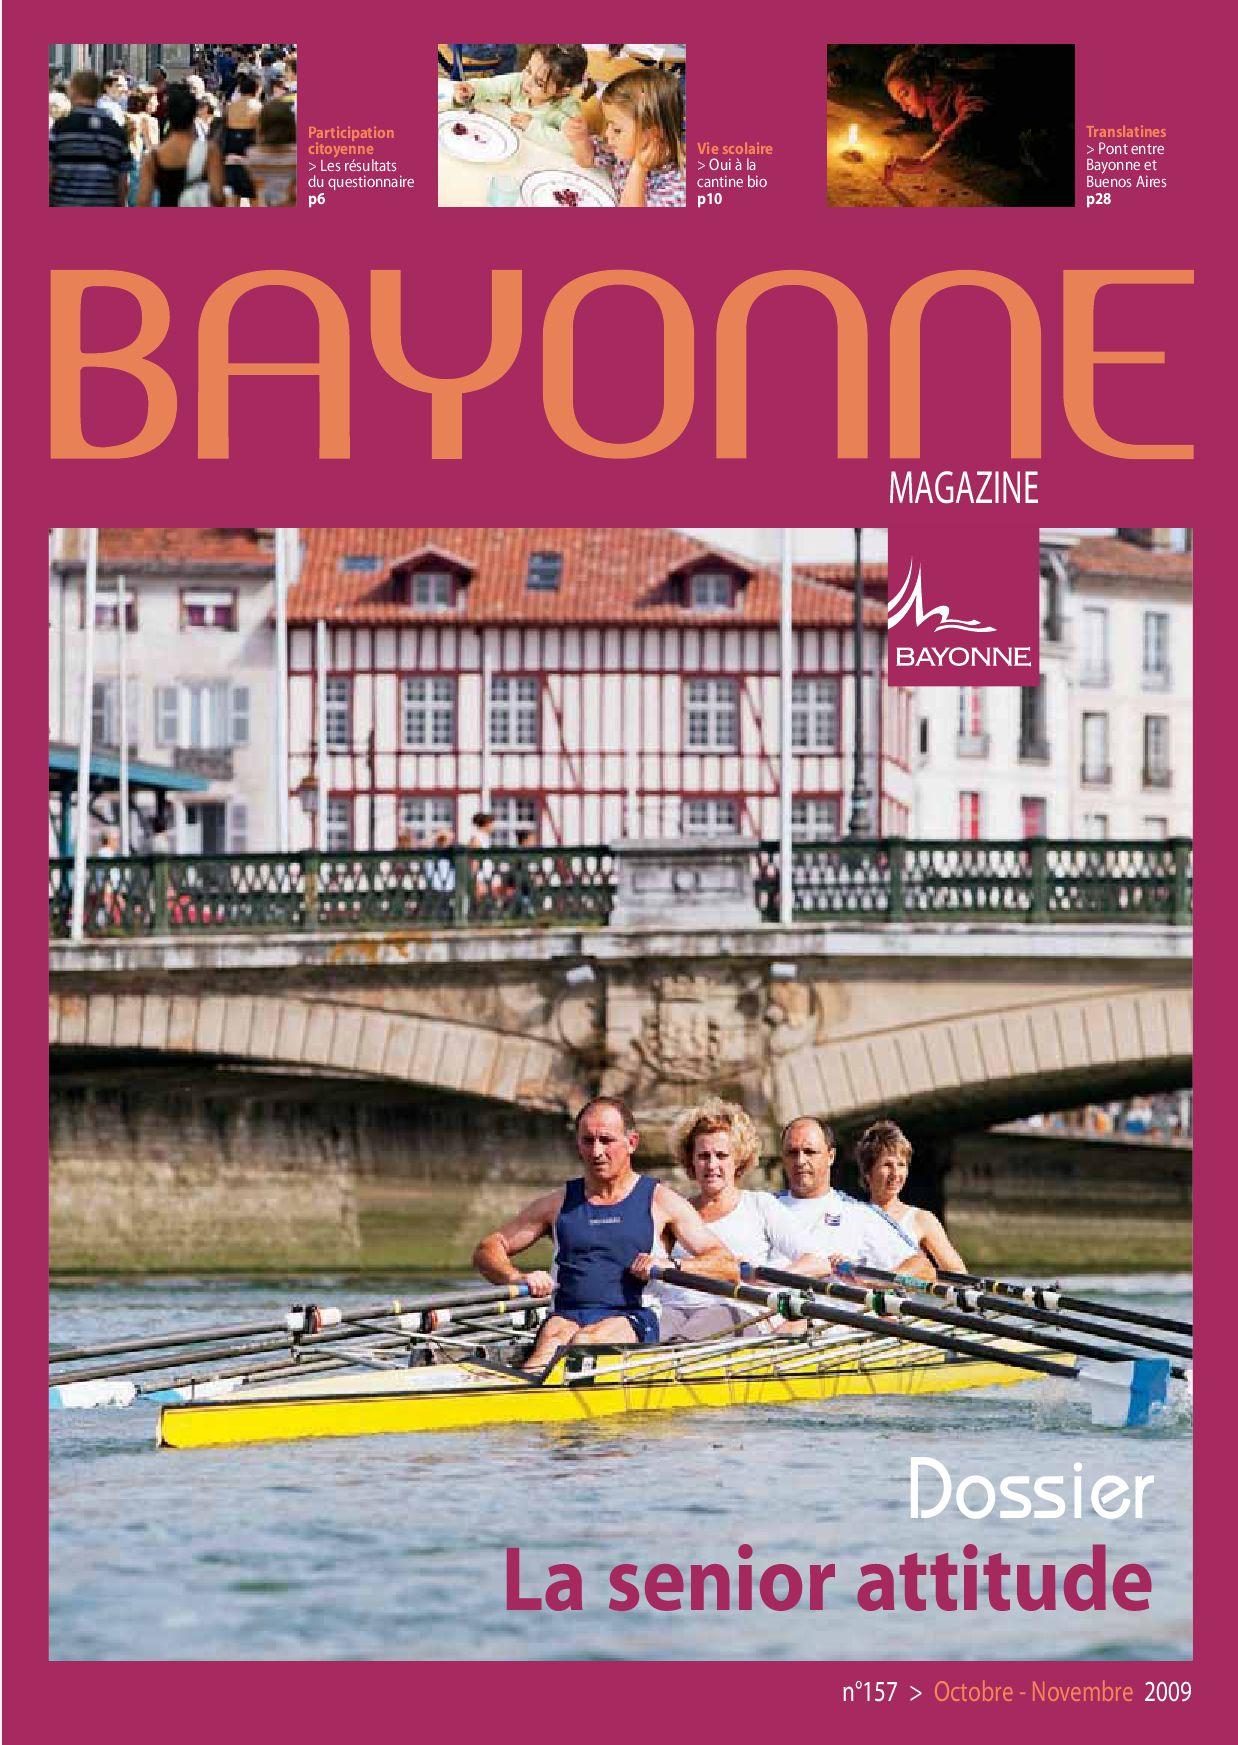 Bayonne Mag 157 Sept-Oct 2009 By Bayonne - Issuu dedans Centre Aquatique Des Hauts De Bayonne Piscine Bayonne